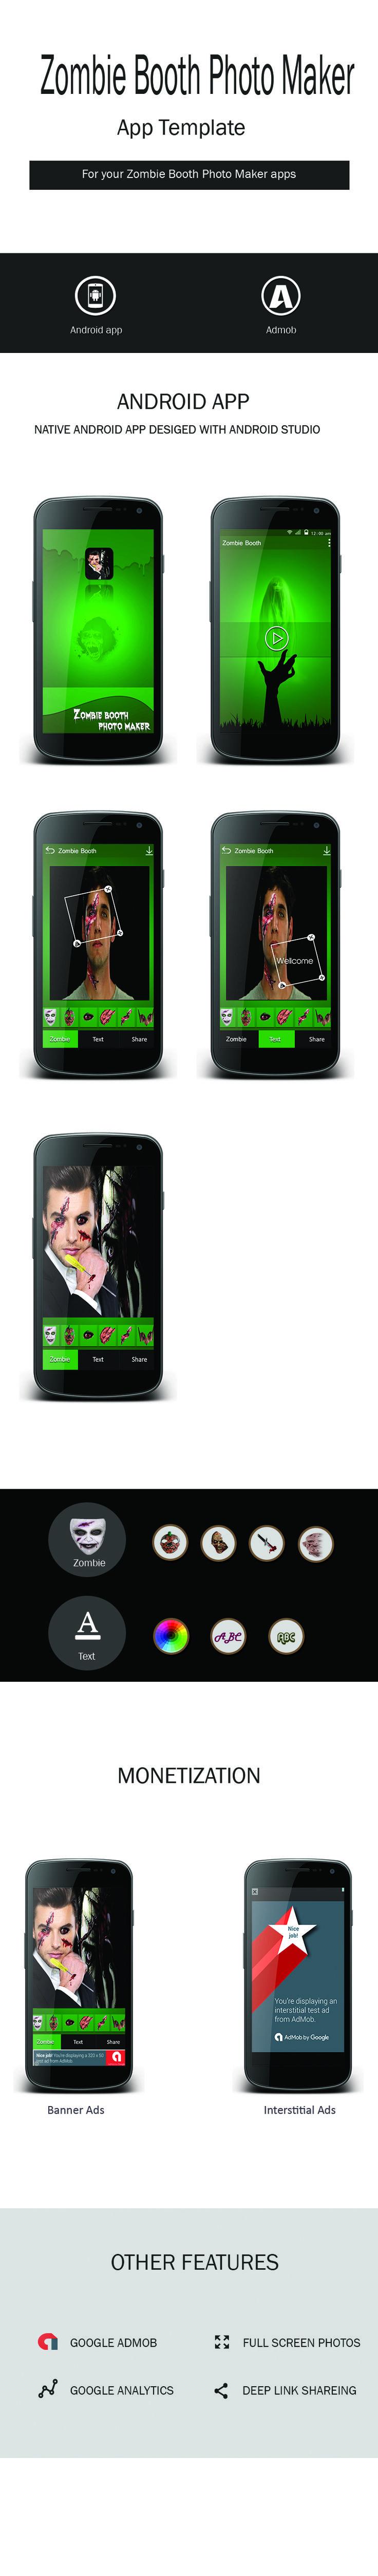 Zombie Booth Photo Maker (Photo Editing App) (Utilities)